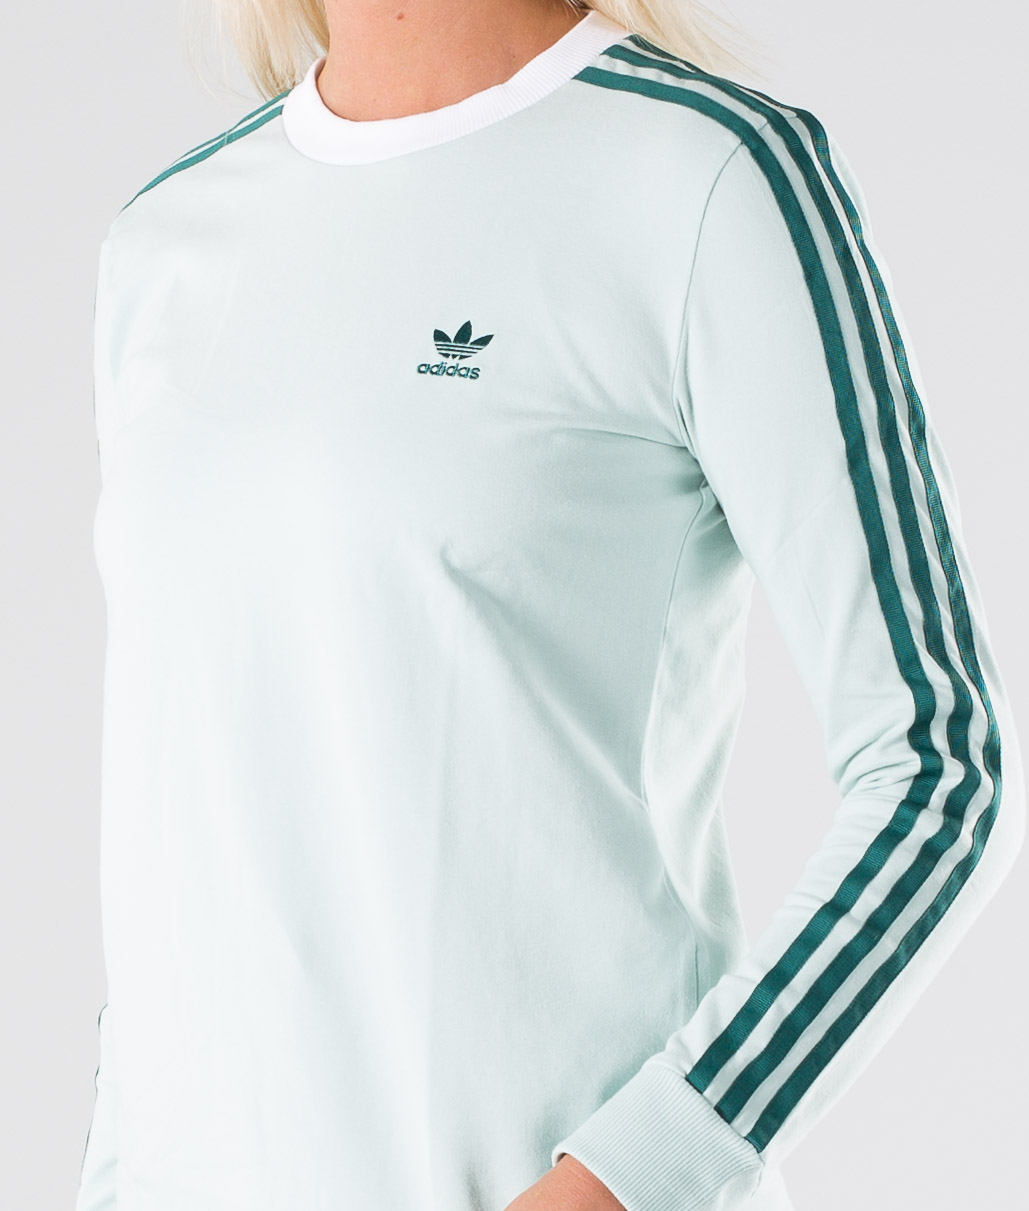 Adidas Originals 3 Stripes Long Sleeve Tee Longsleeve Vapour Green